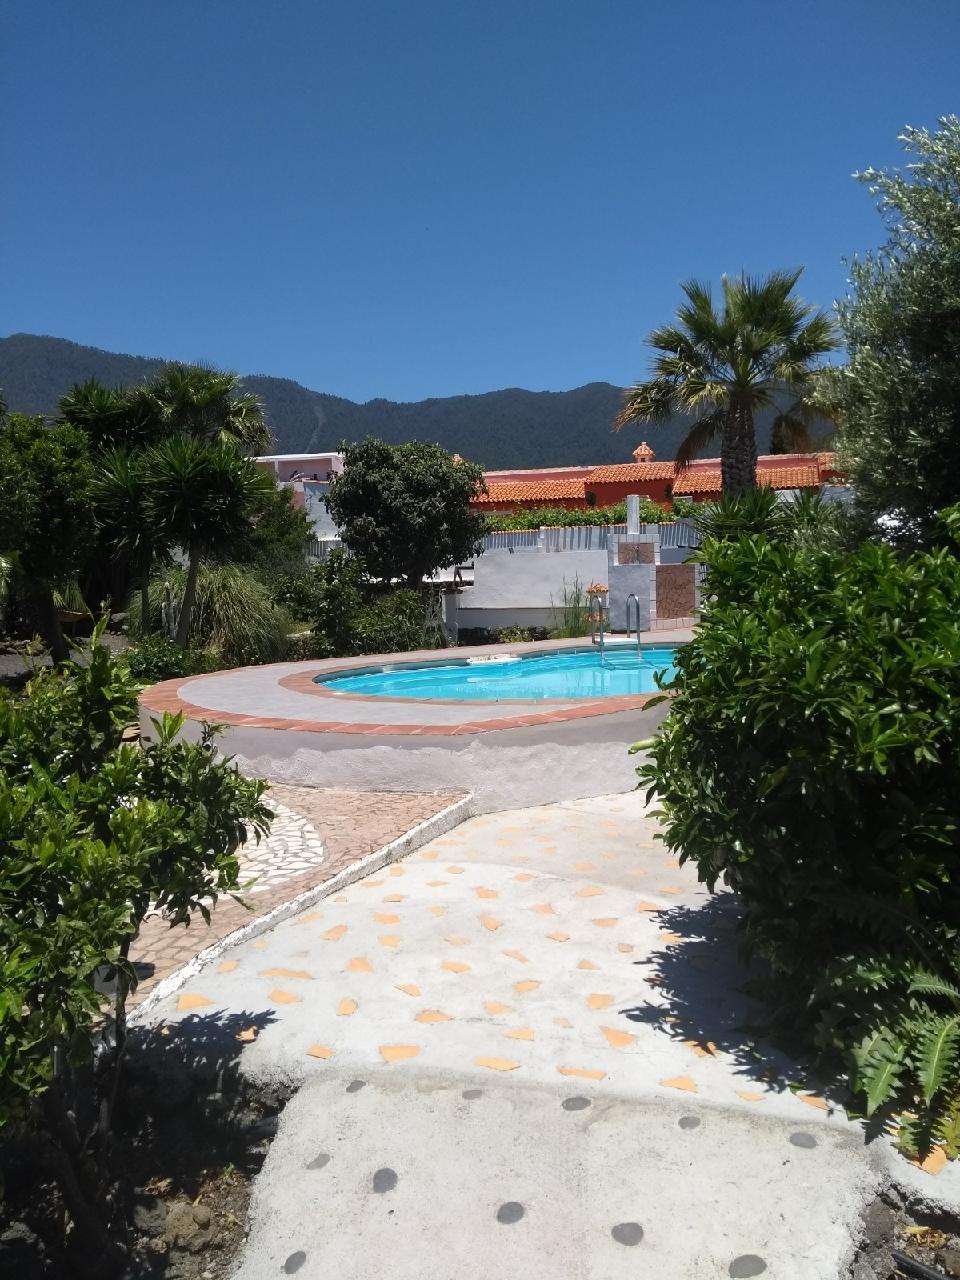 Ferienhaus Finca Primavera (144701), El Paso, La Palma, Kanarische Inseln, Spanien, Bild 27